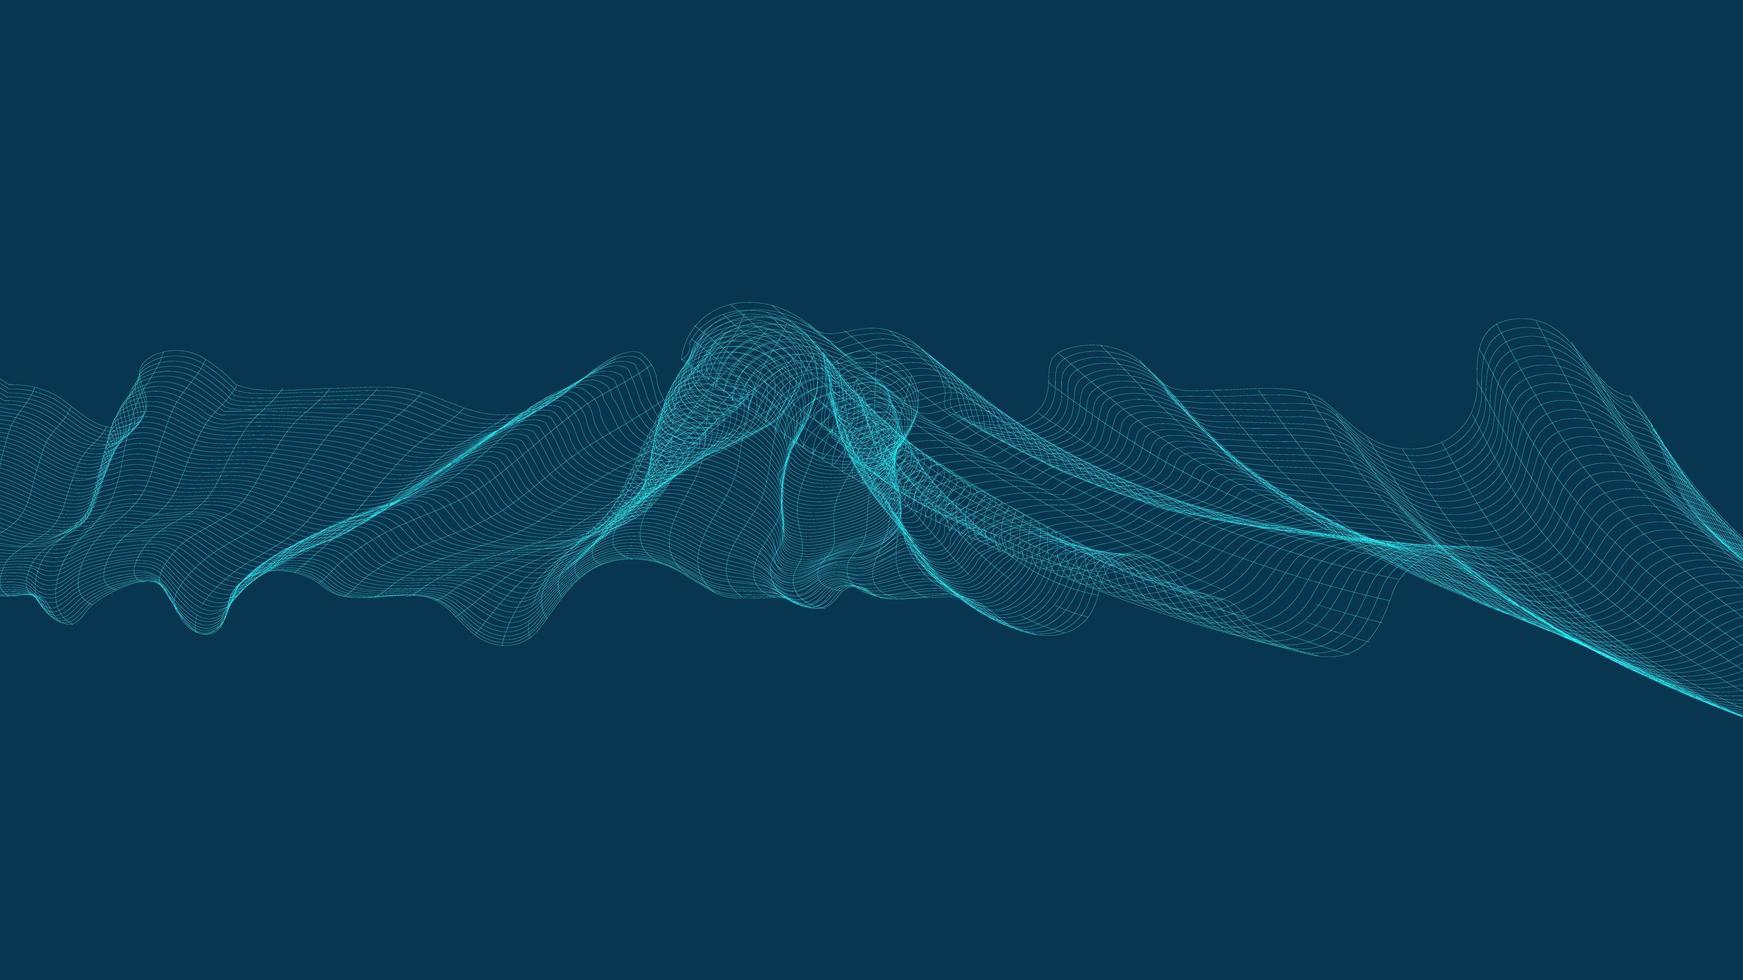 Onda de sonido digital abstracta sobre fondo azul. vector